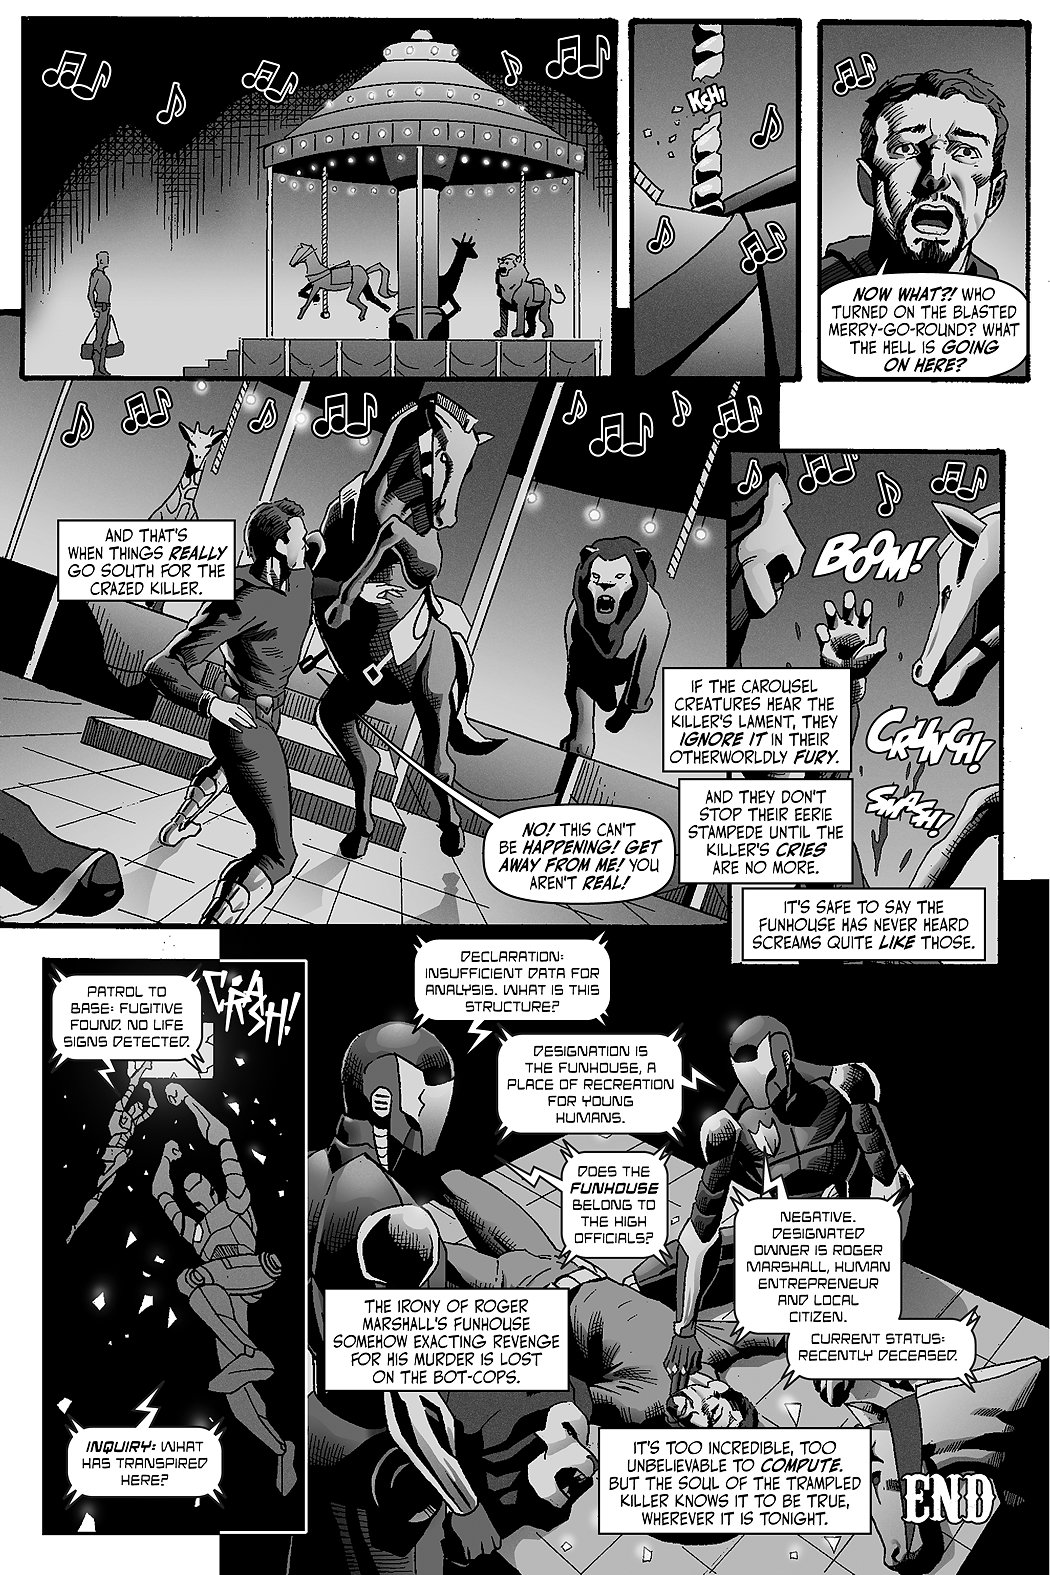 Carousel_Page03.jpg